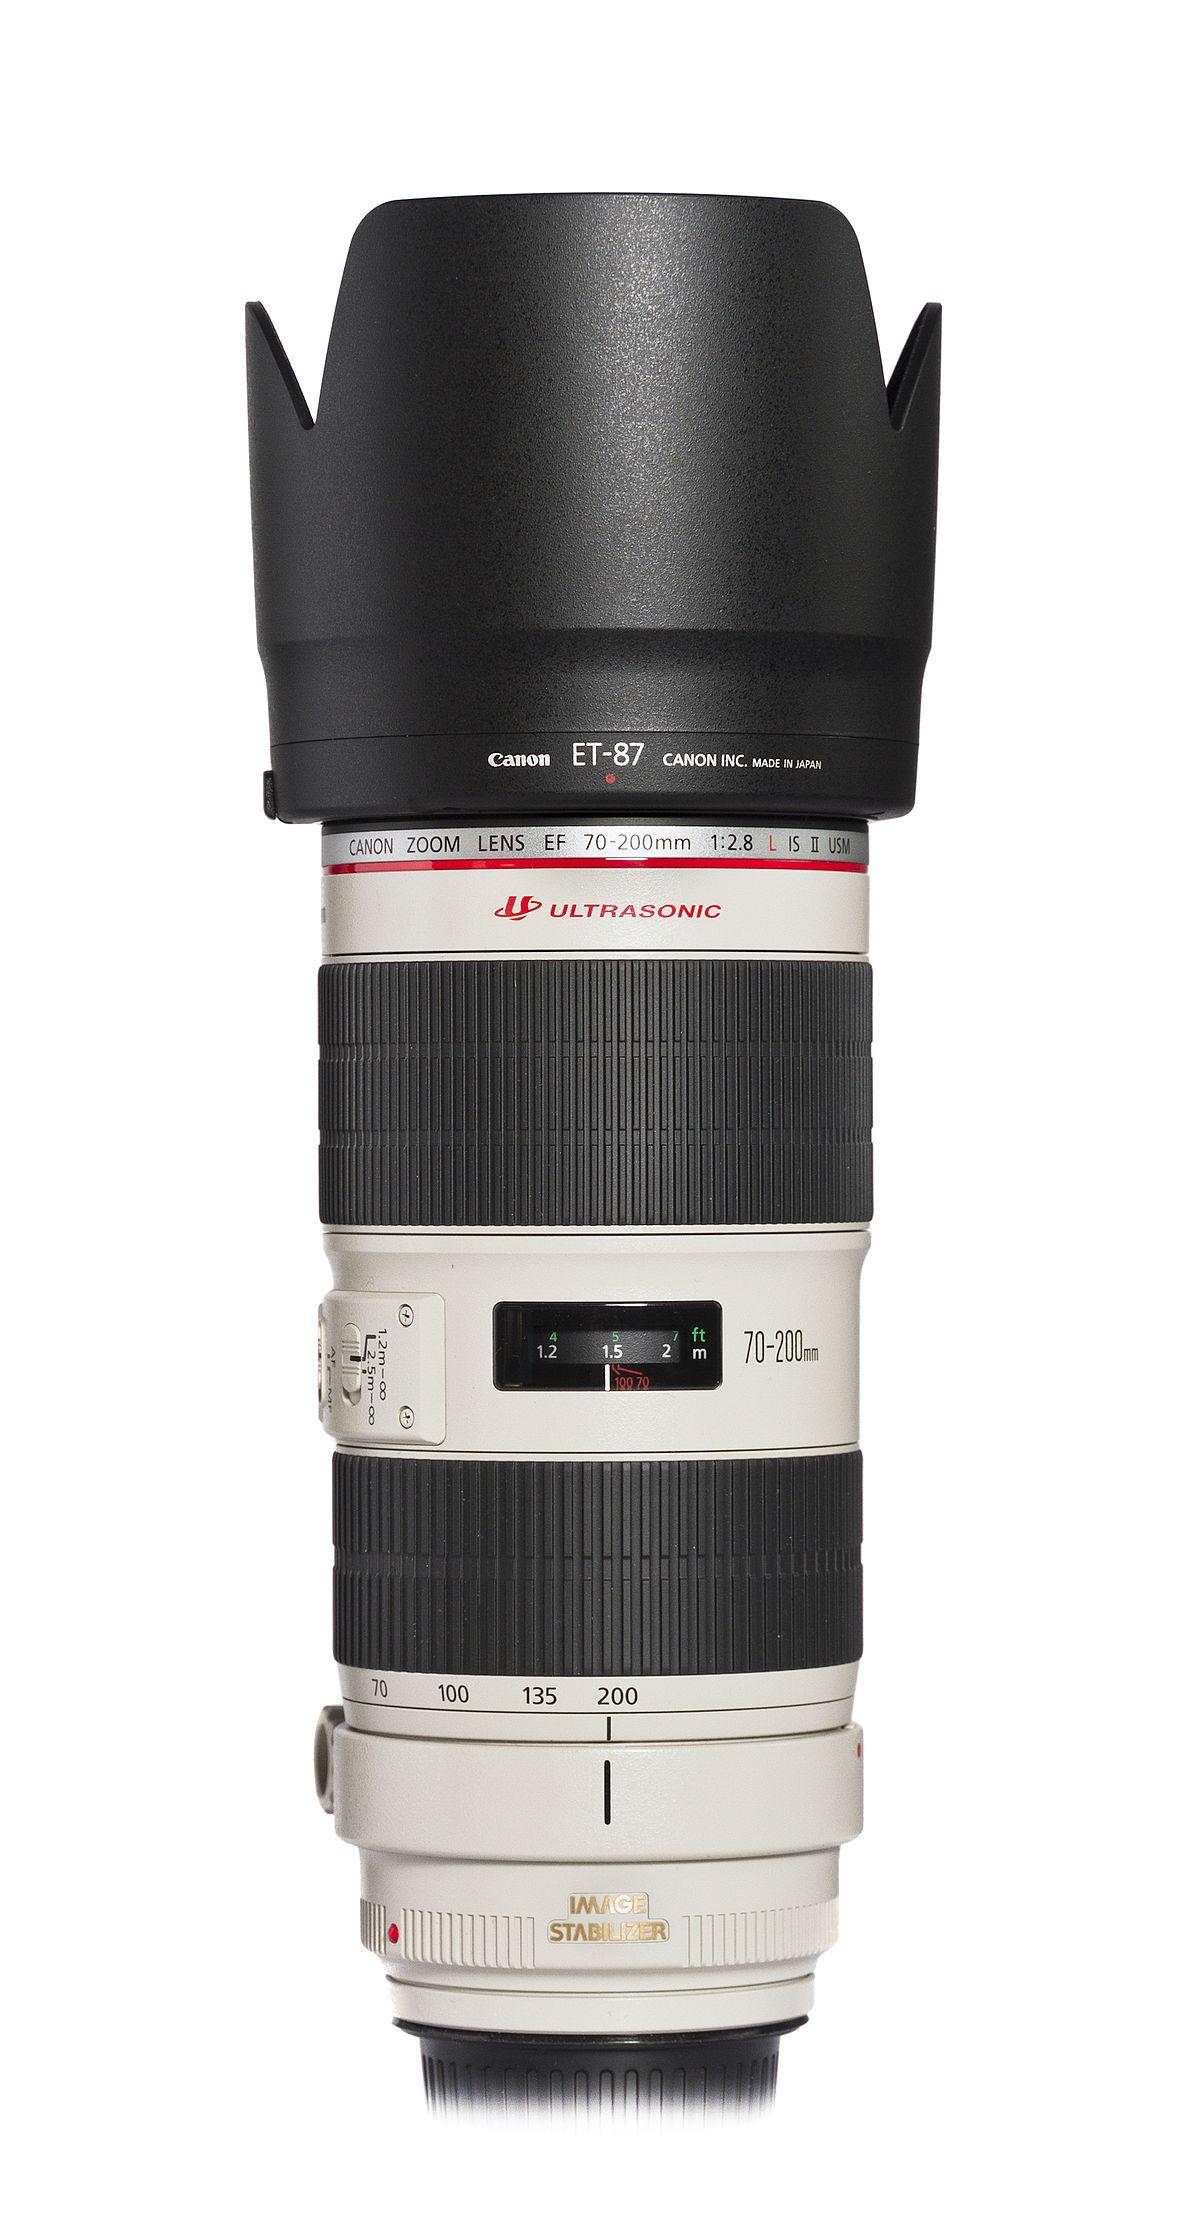 Canon Ef 70 200mm Lens Wikipedia